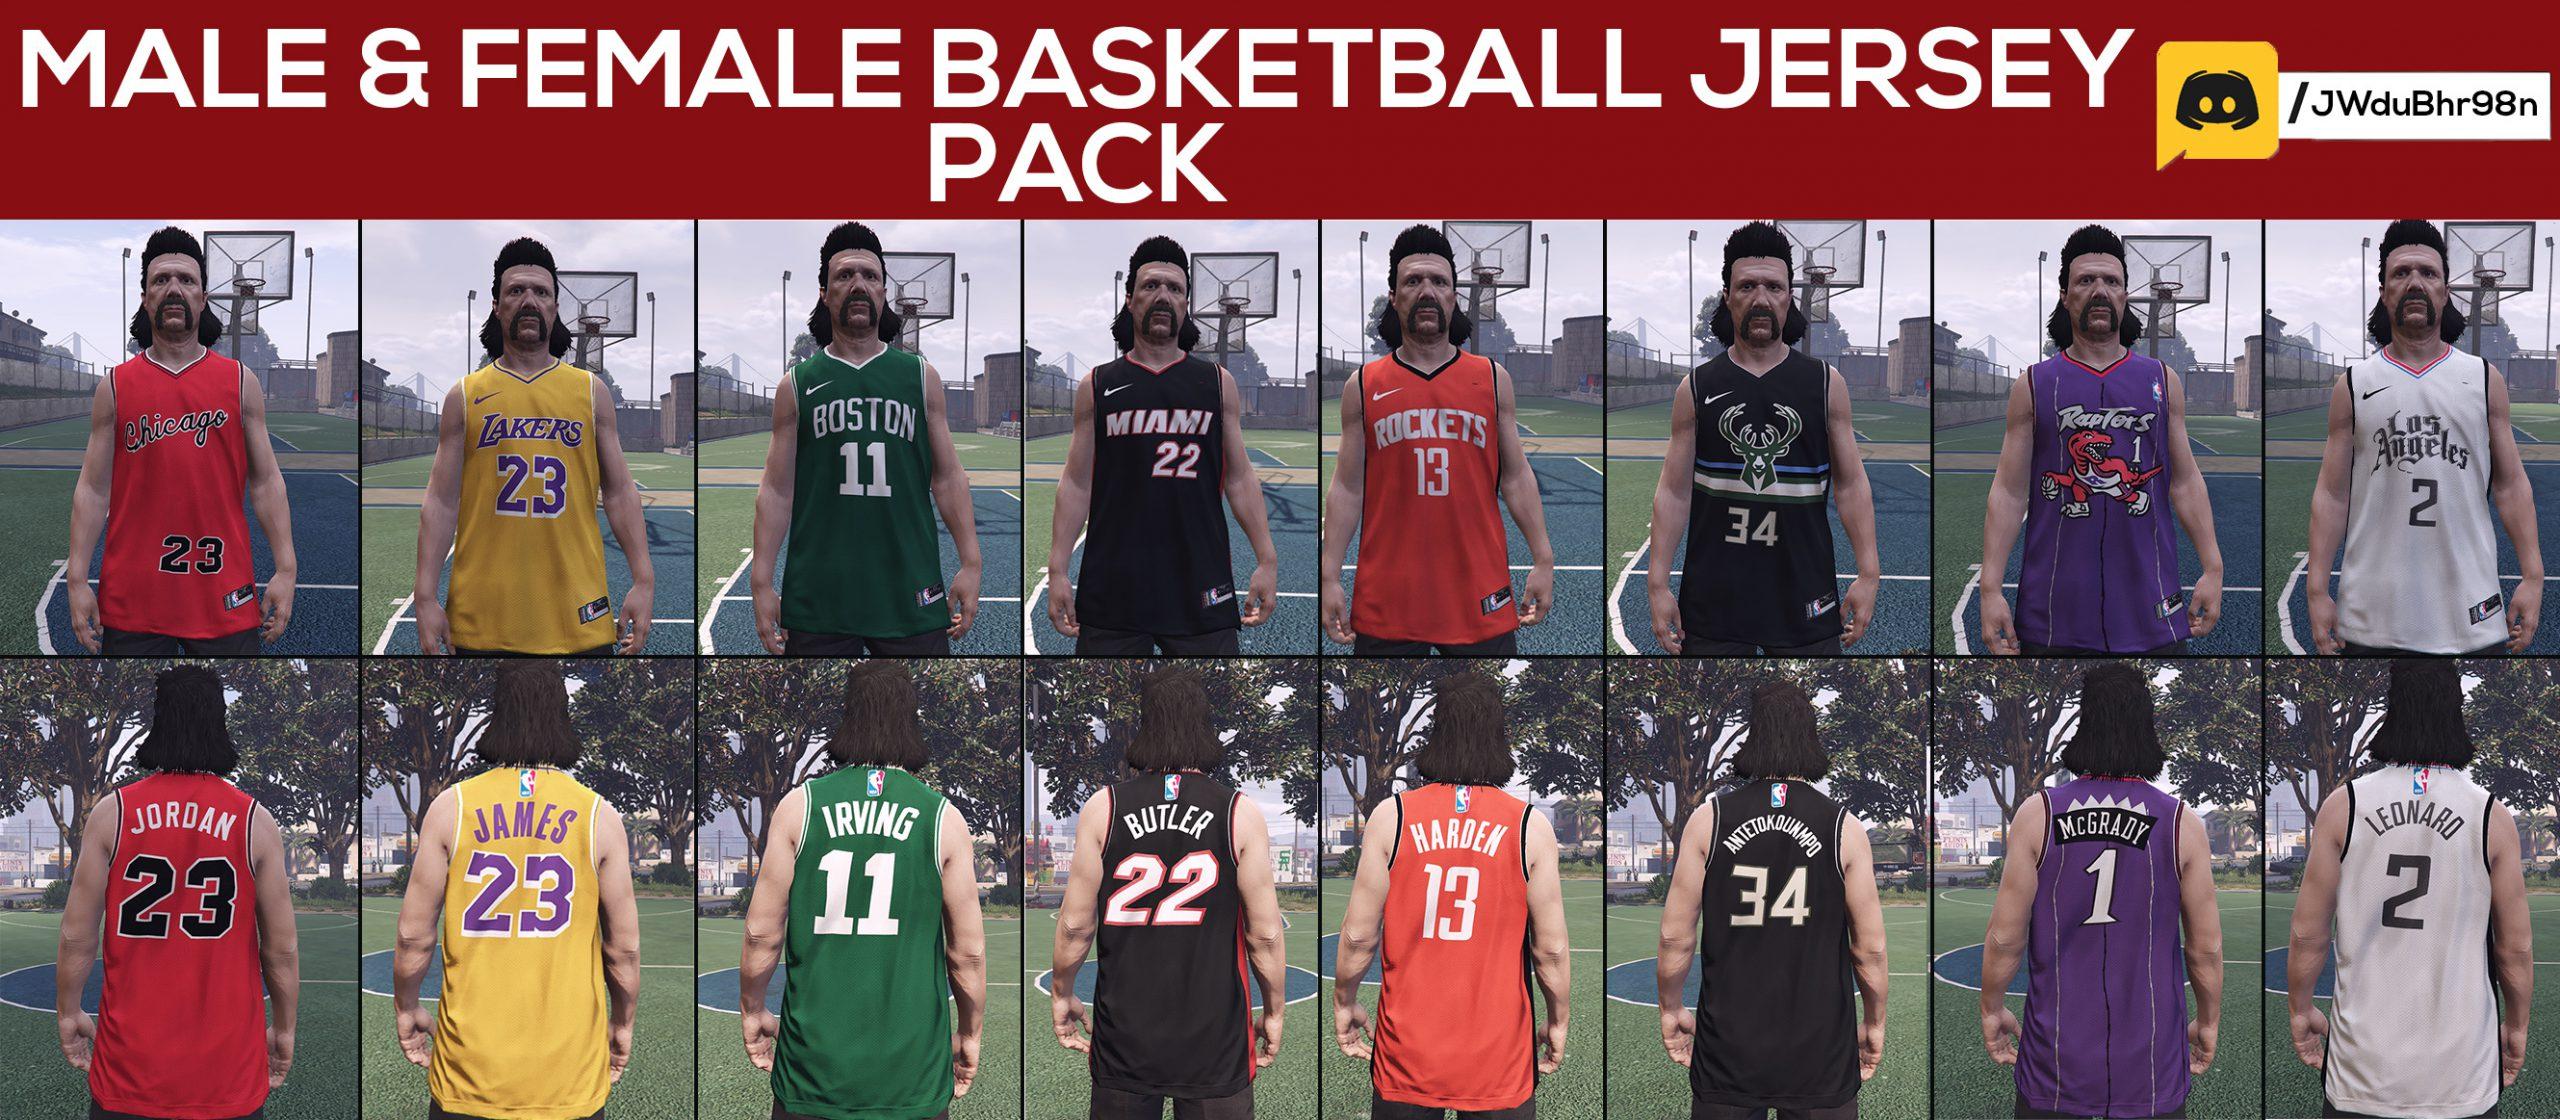 Male & Female Basketball Jersey Pack 1.0